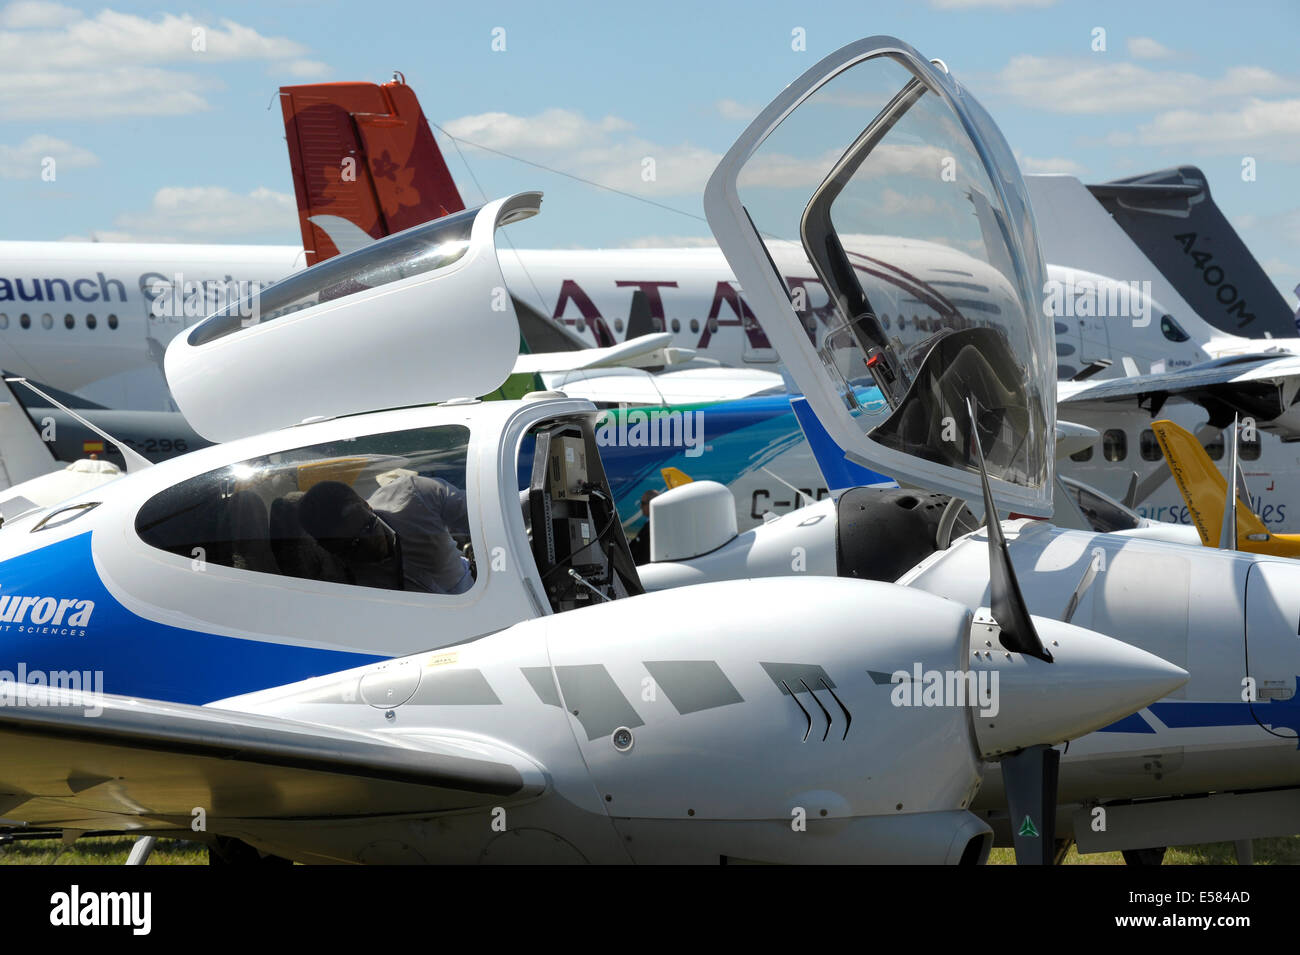 Aircraft park at Farnborough Air Show - Stock Image